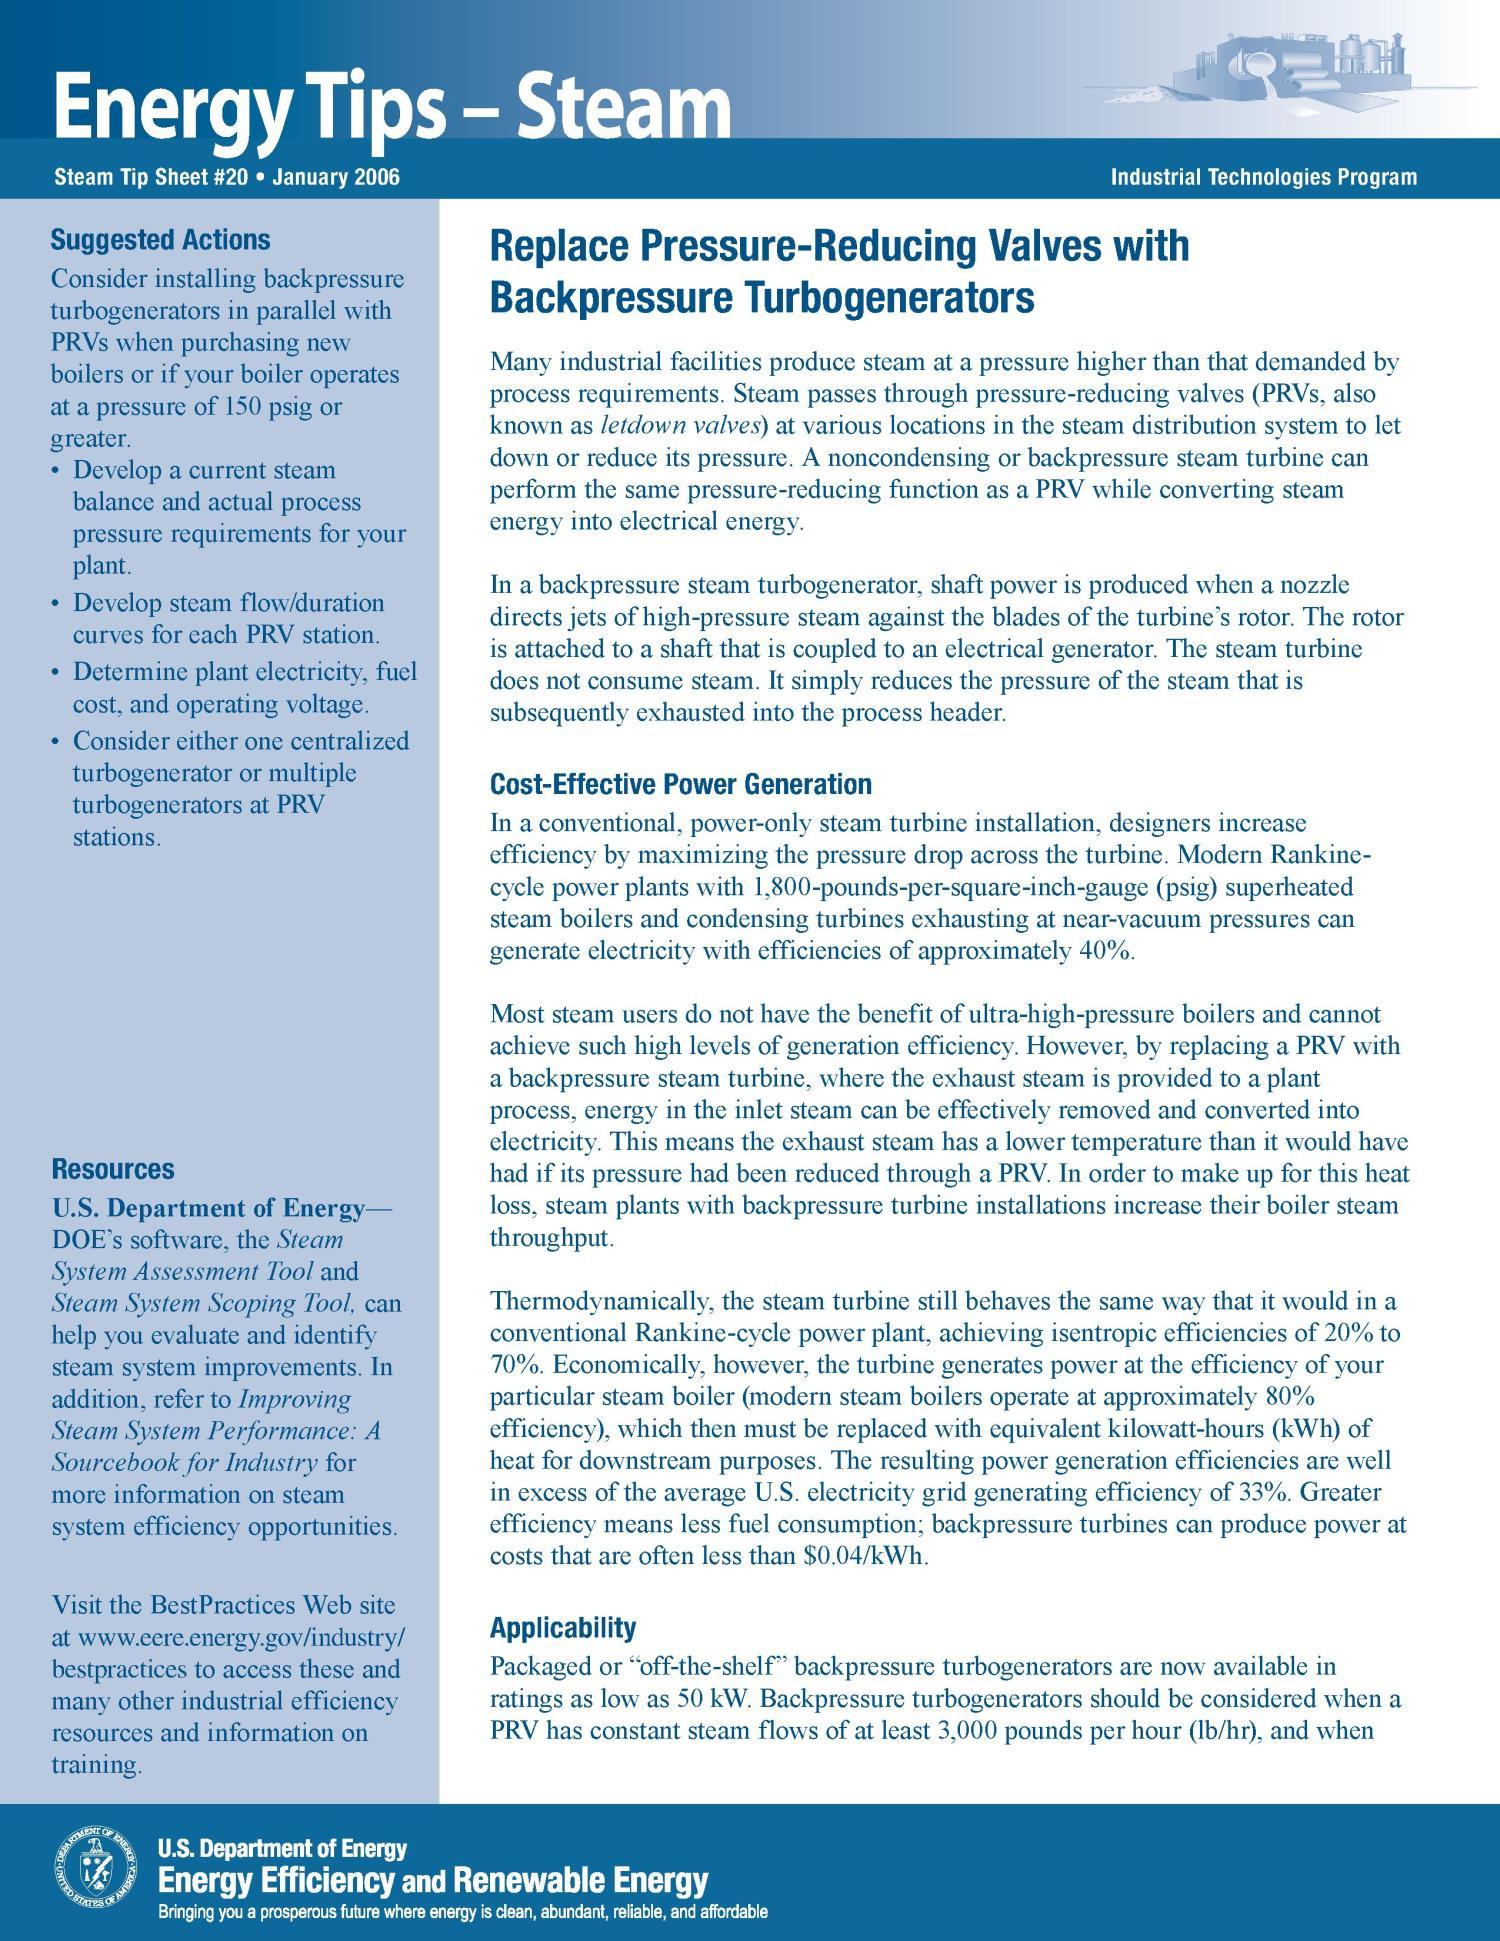 Replace Pressure Reducing Valves with Backpressure Turbogenerators